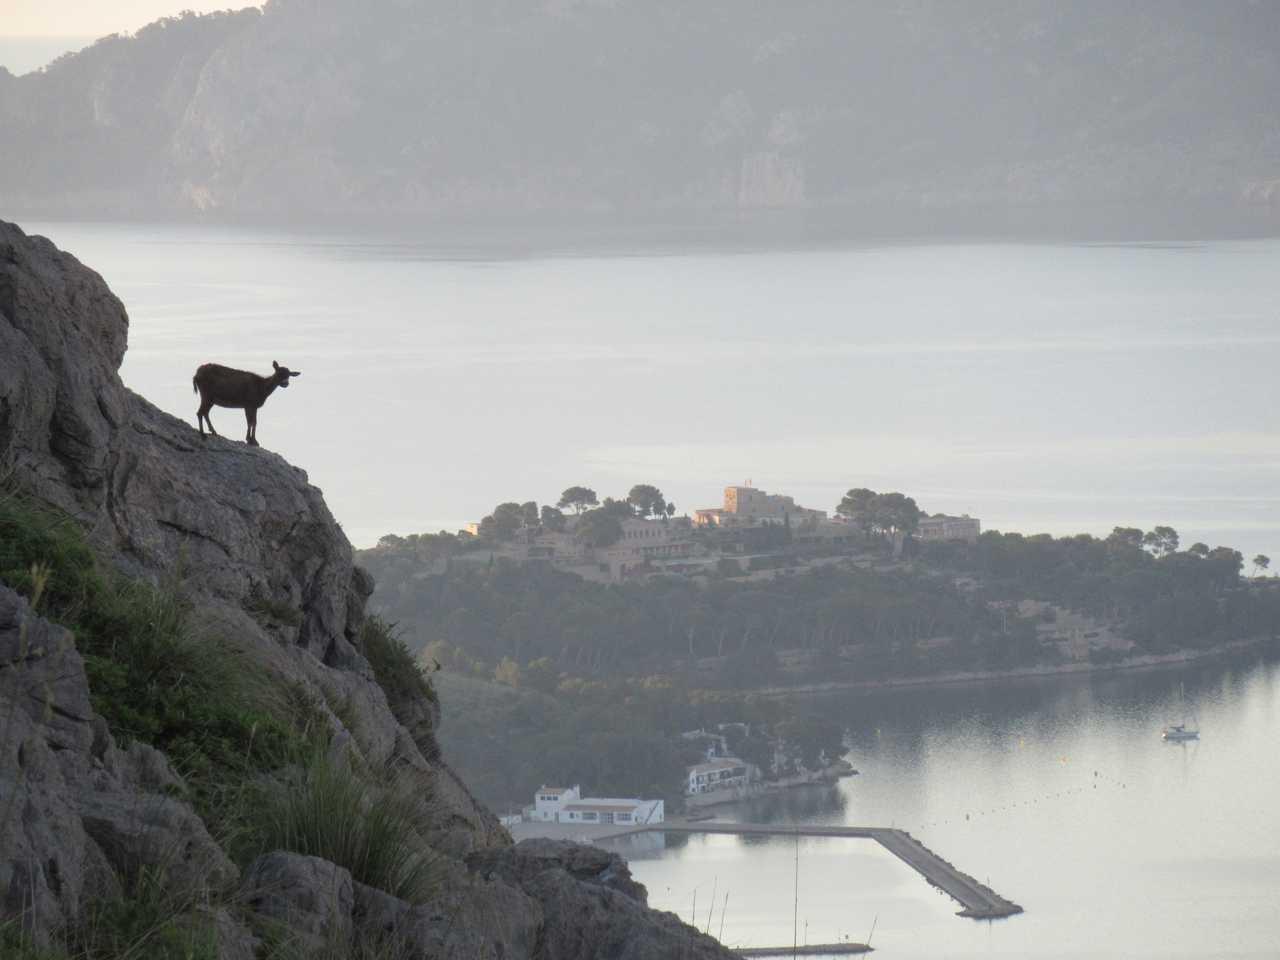 The mountain goats make for good company.